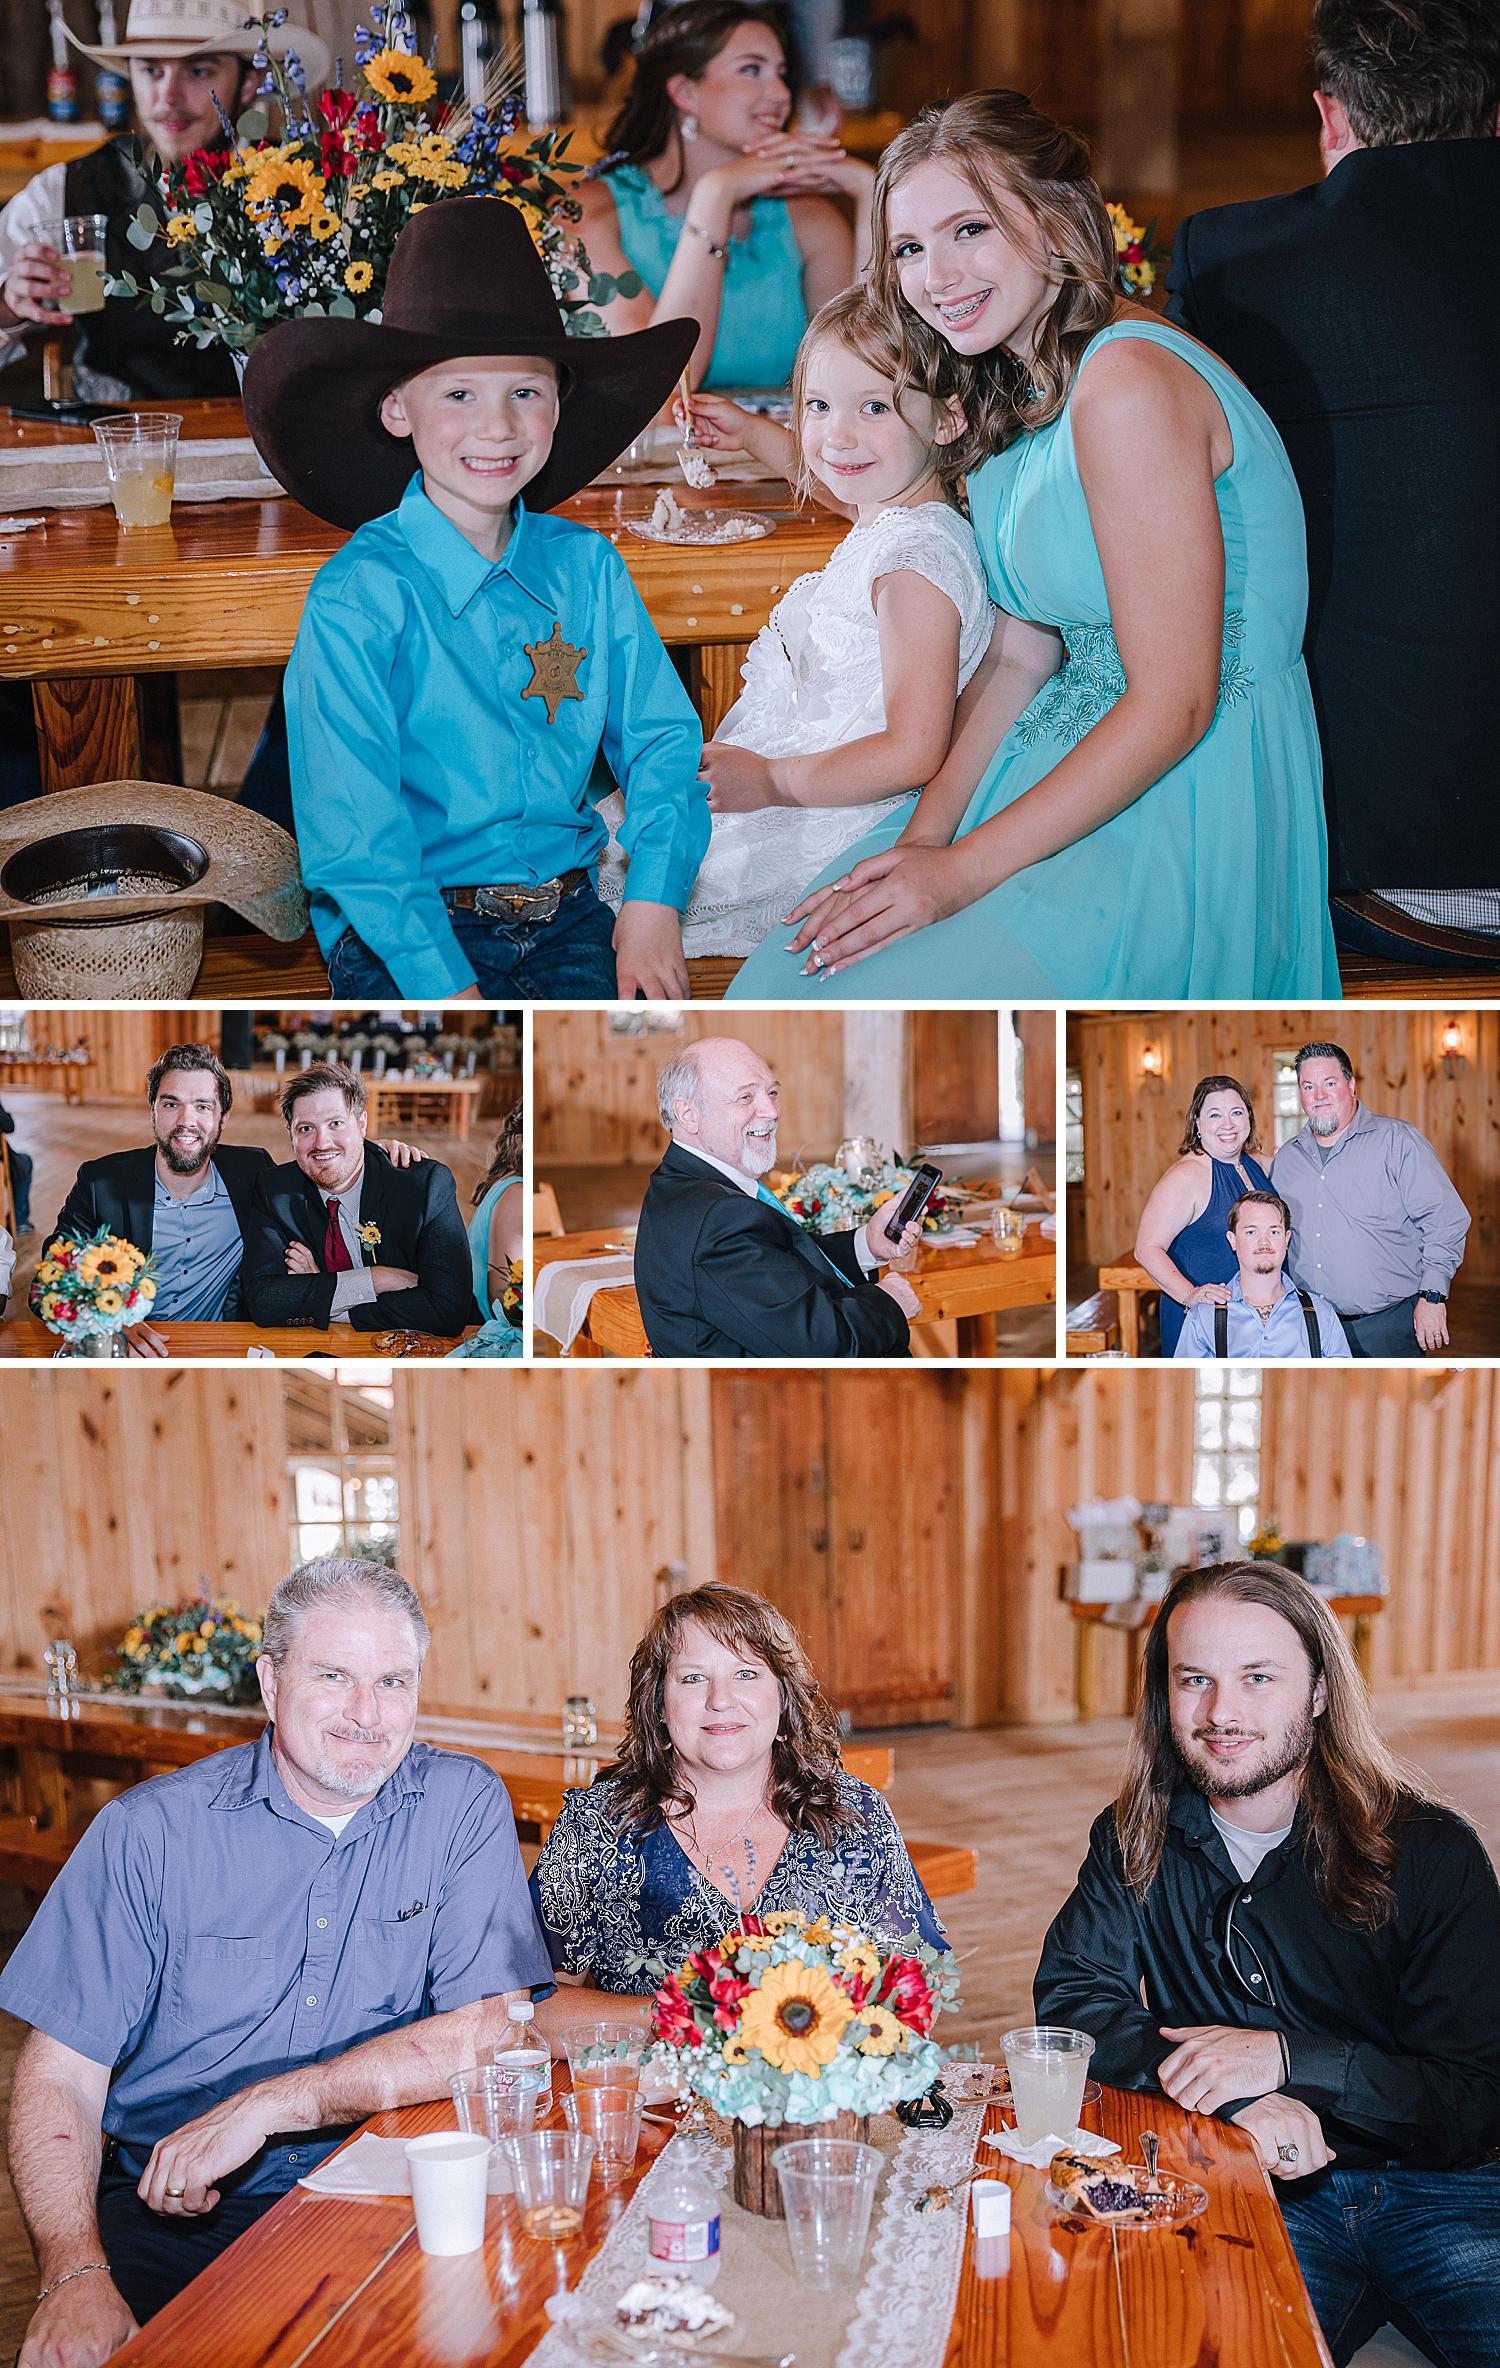 Carly-Barton-Photography-Old-Town-Texas-Rustic-Wedding-Photos-Sunflowers-Boots-Kyle-Texas_0077.jpg